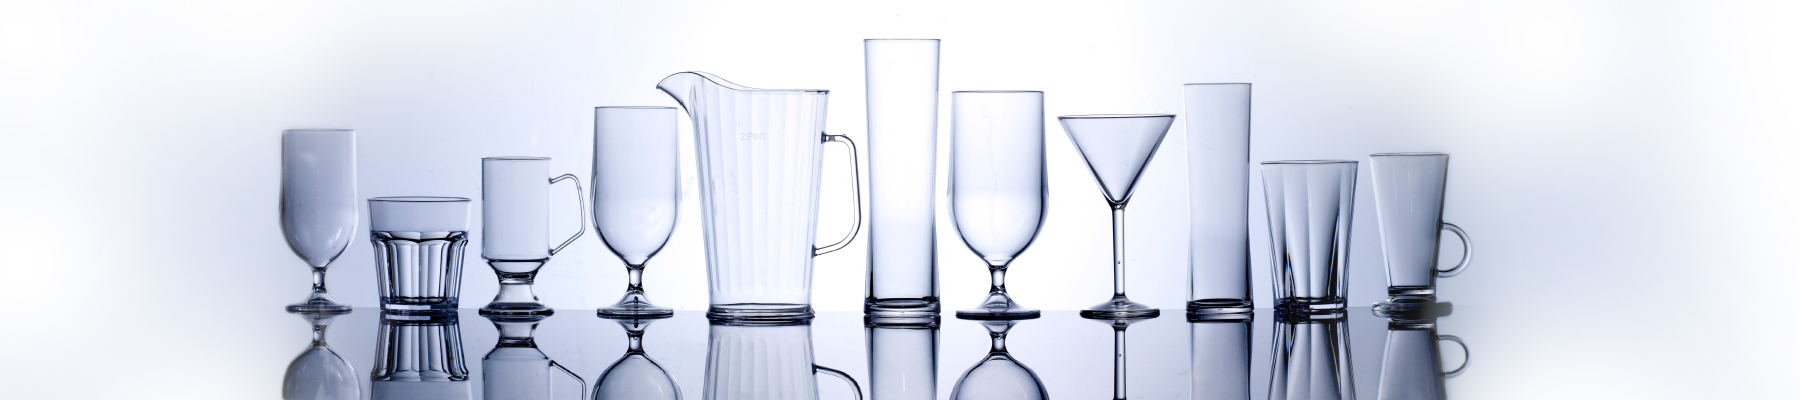 plastic polycarbonate glasses